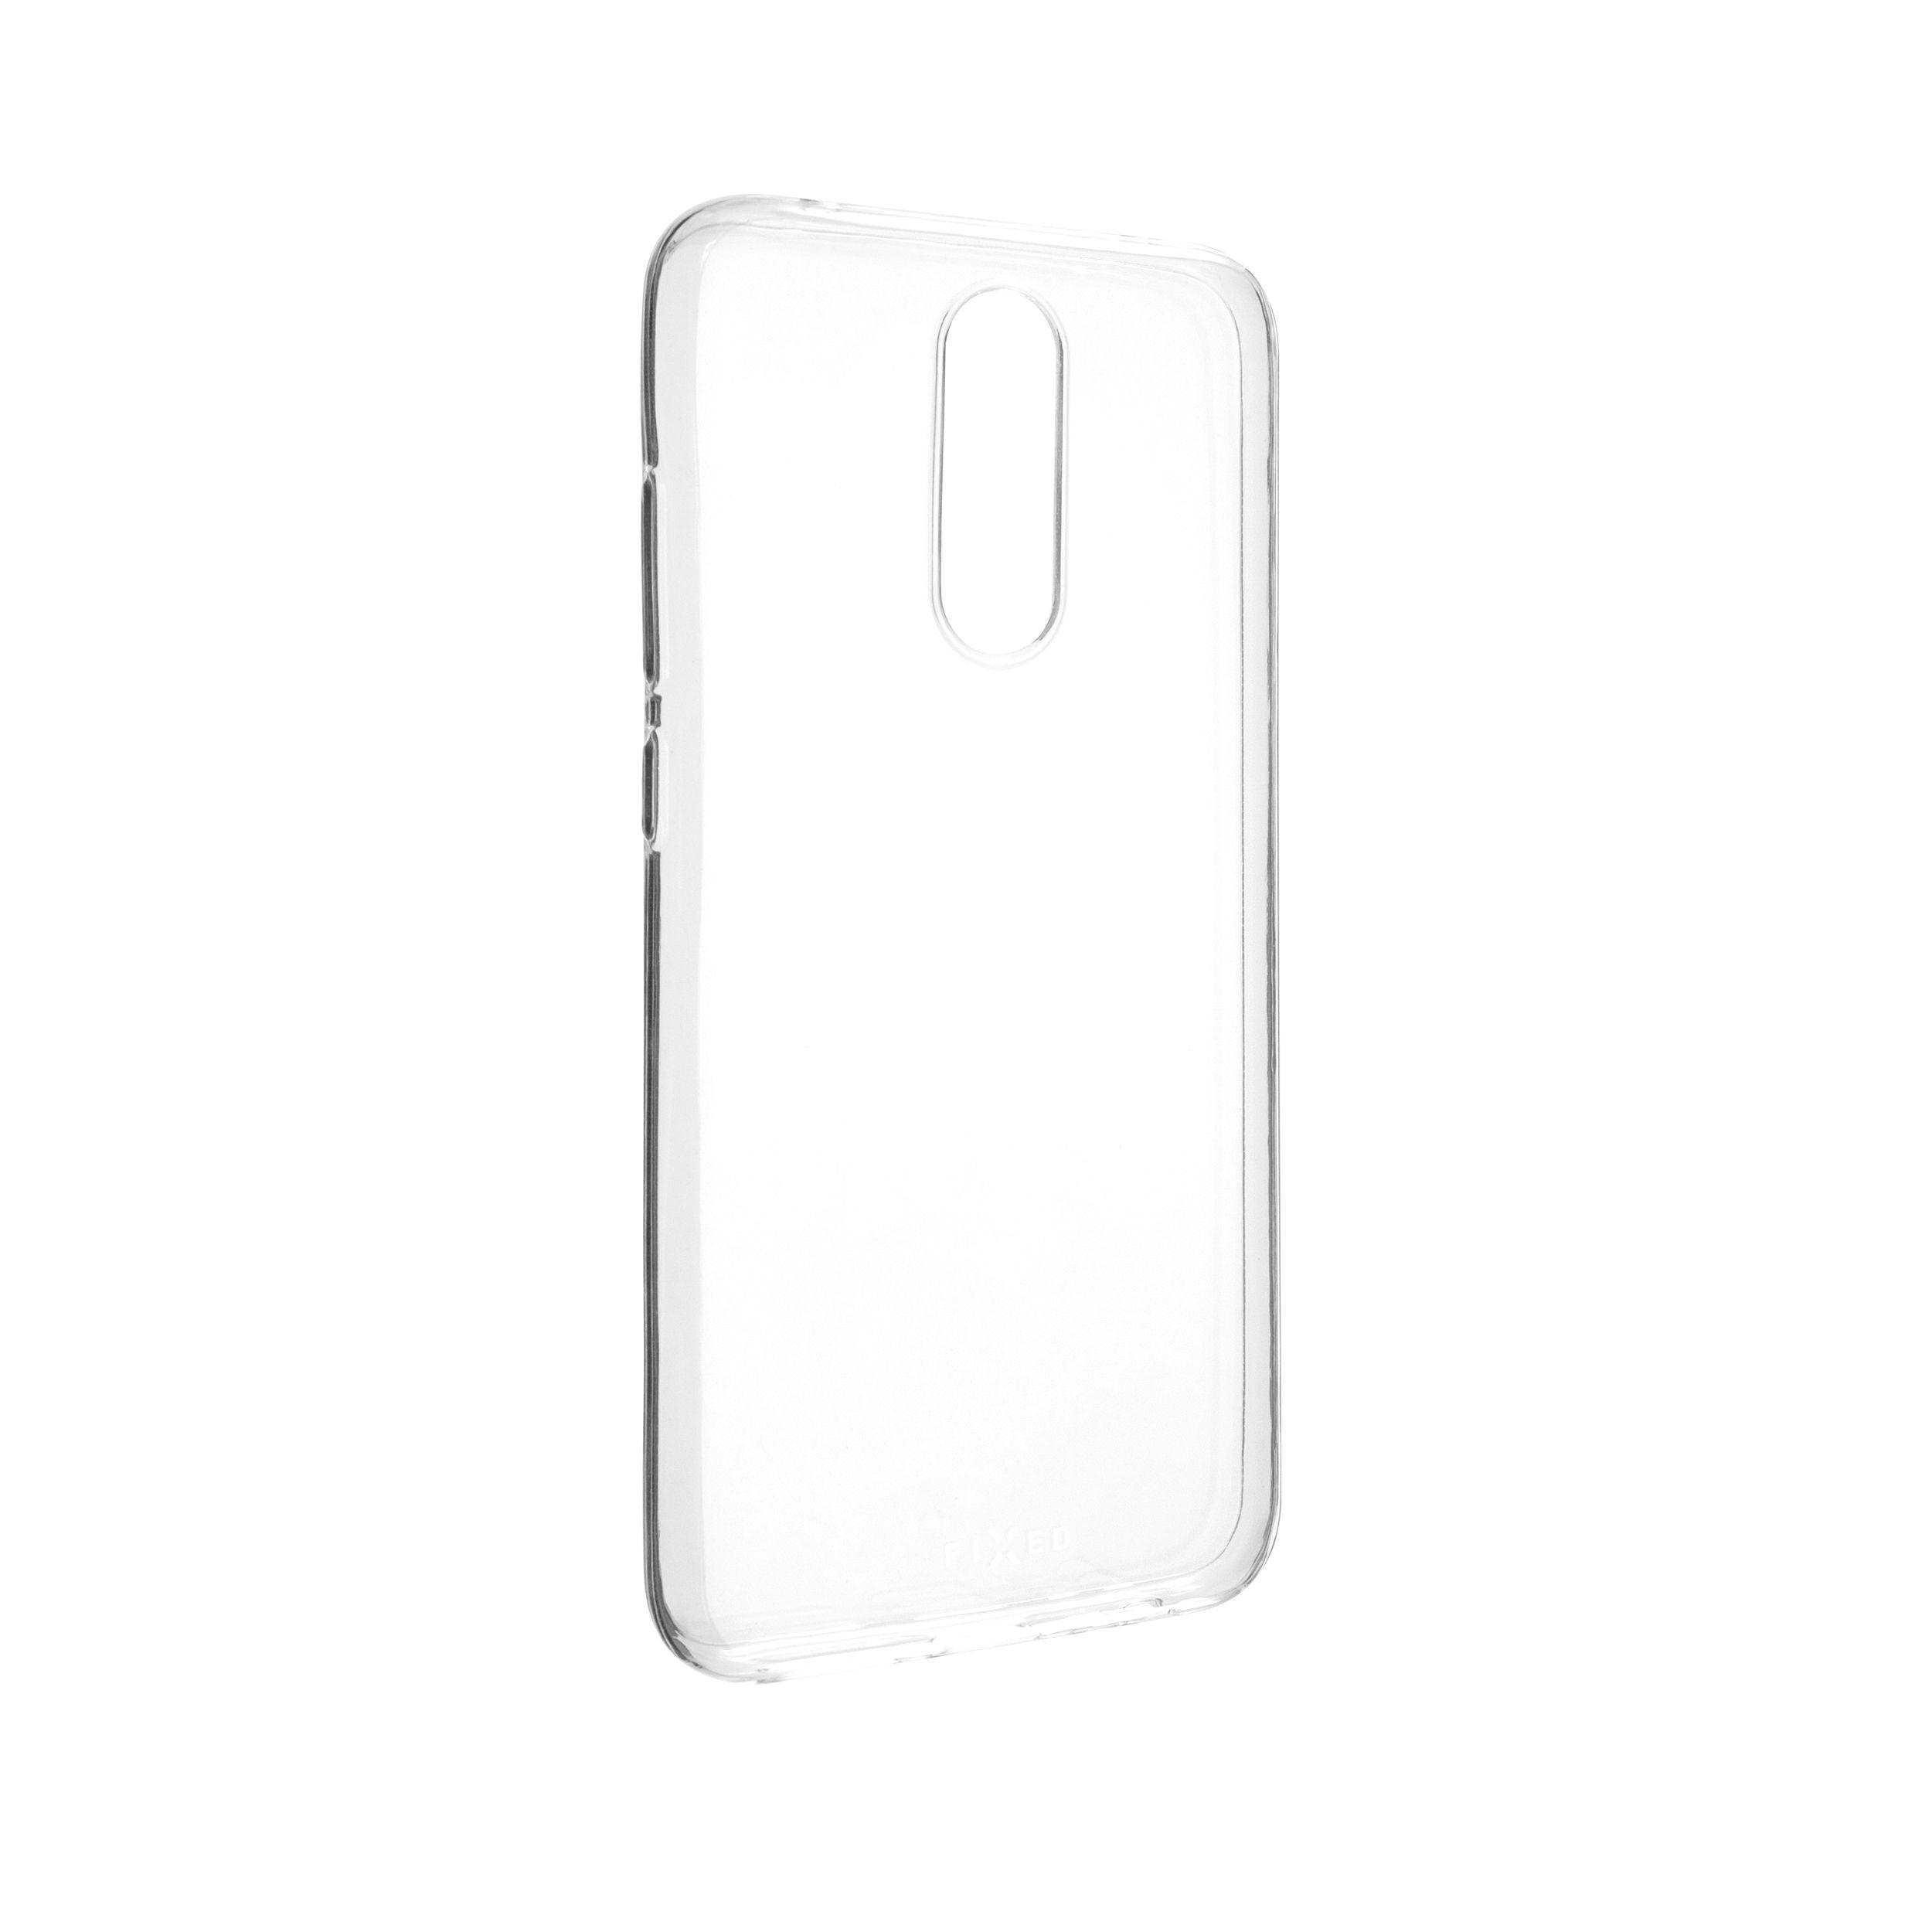 Ultratenké TPU gelové pouzdro FIXED Skin pro Xiaomi Redmi 8, 0,6 mm, čiré